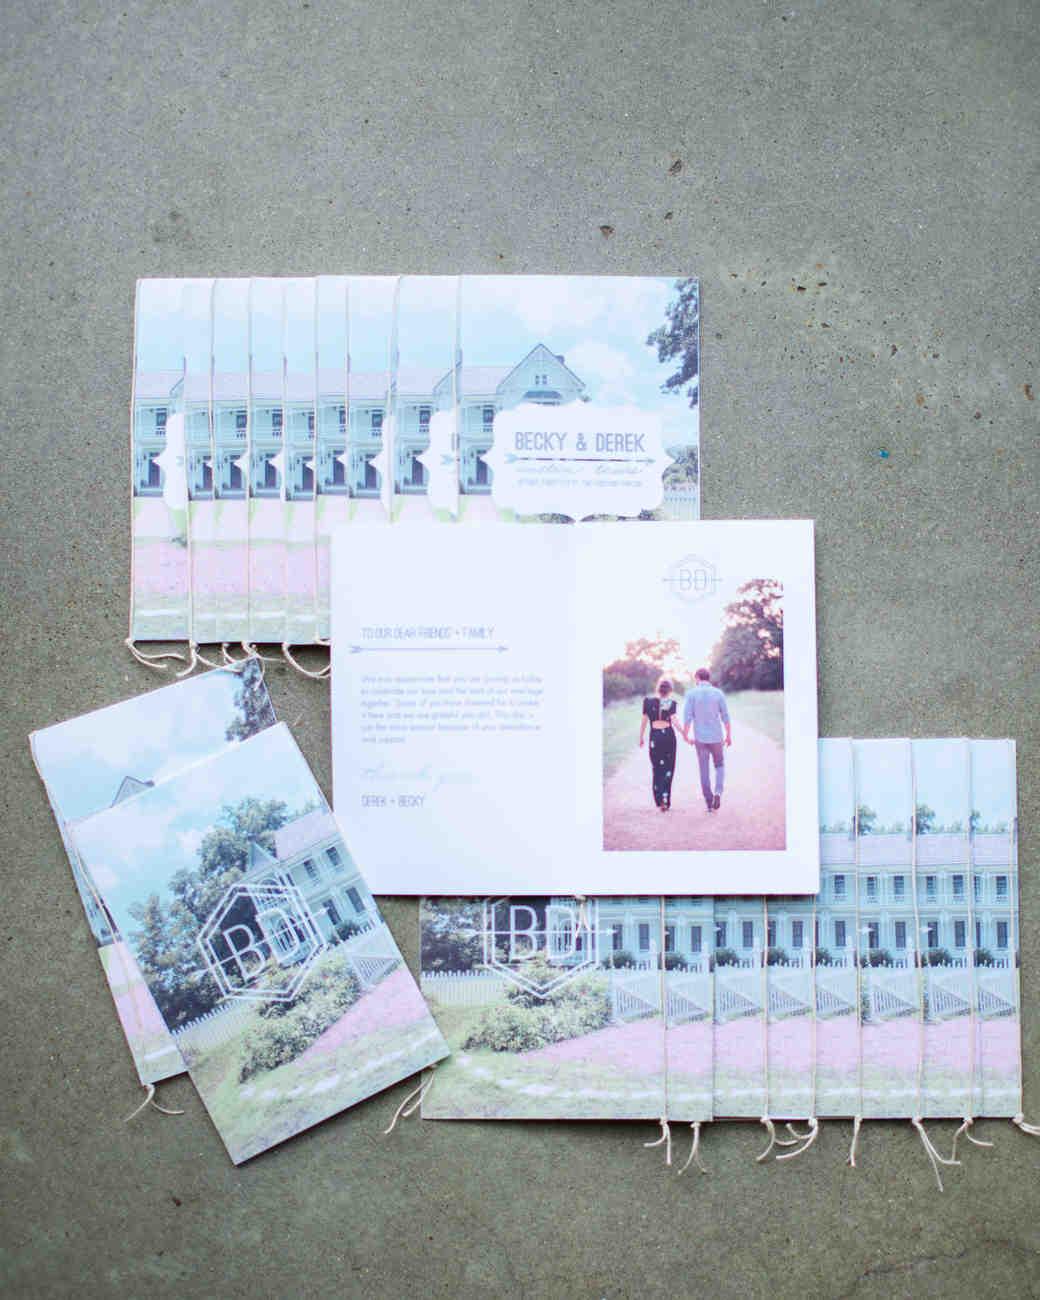 becky-derrick-wedding-program-0714.jpg